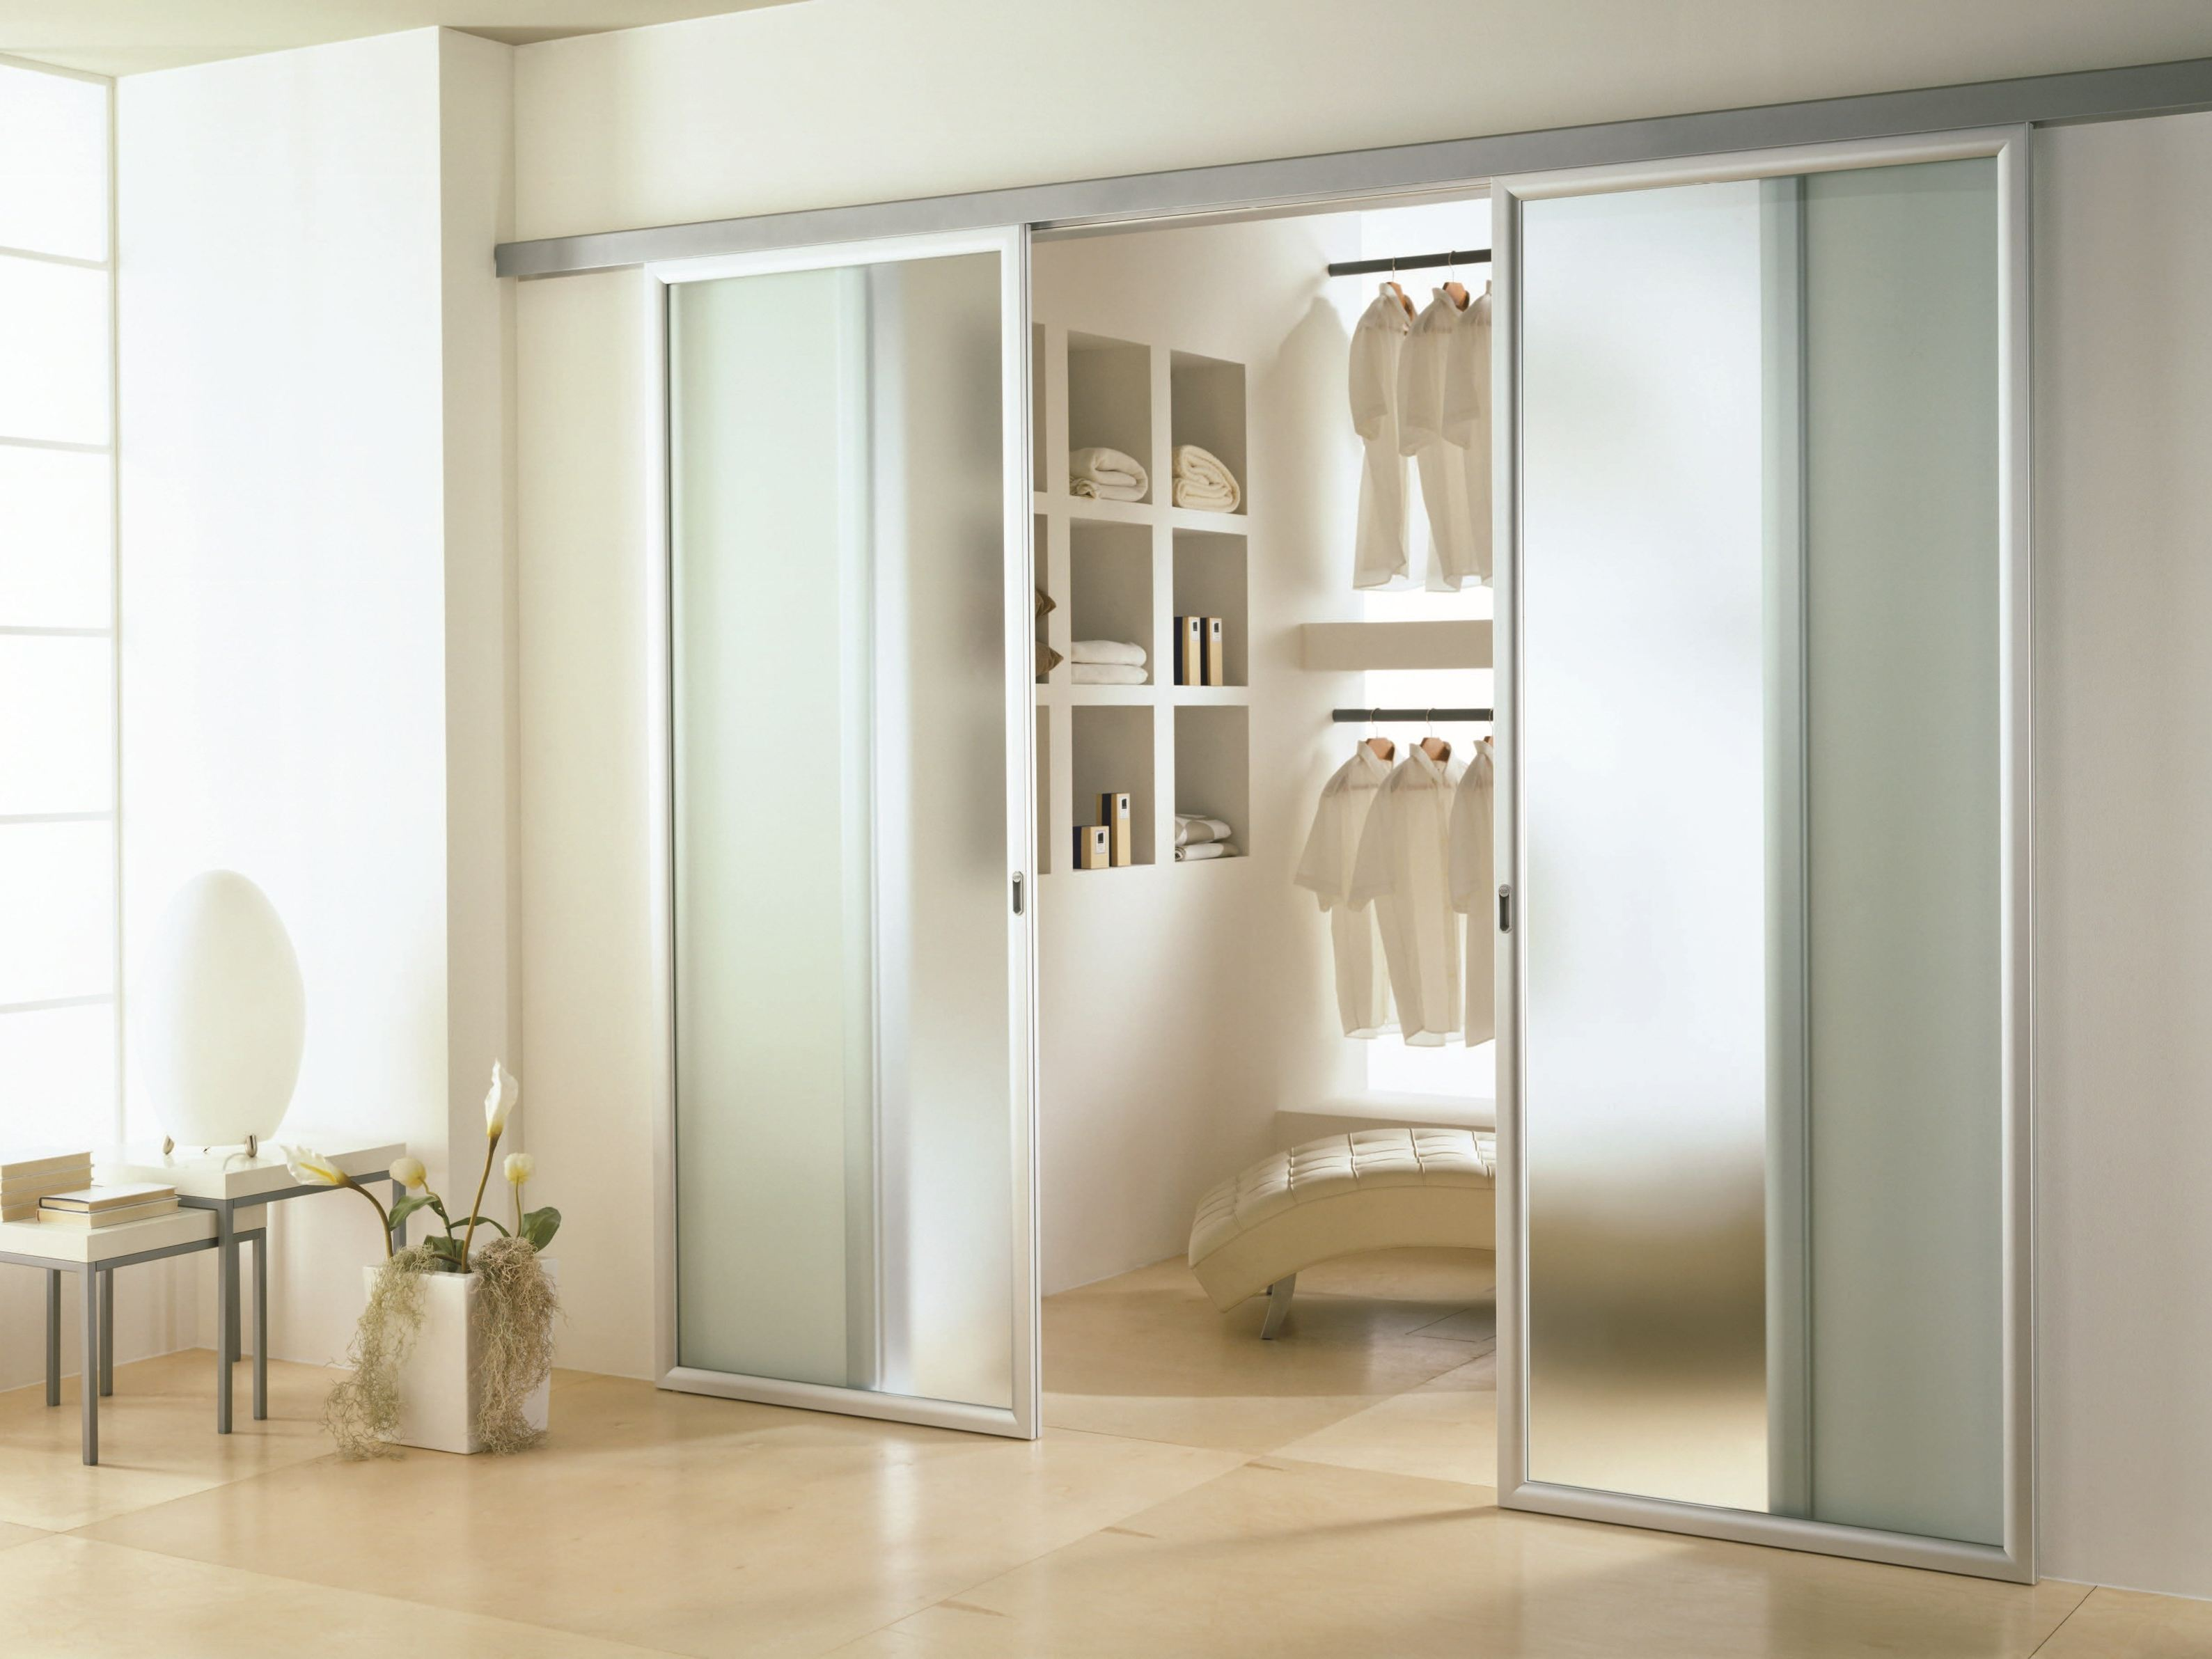 Antha puerta corrediza by gidea - Puertas interiores de cristal ...